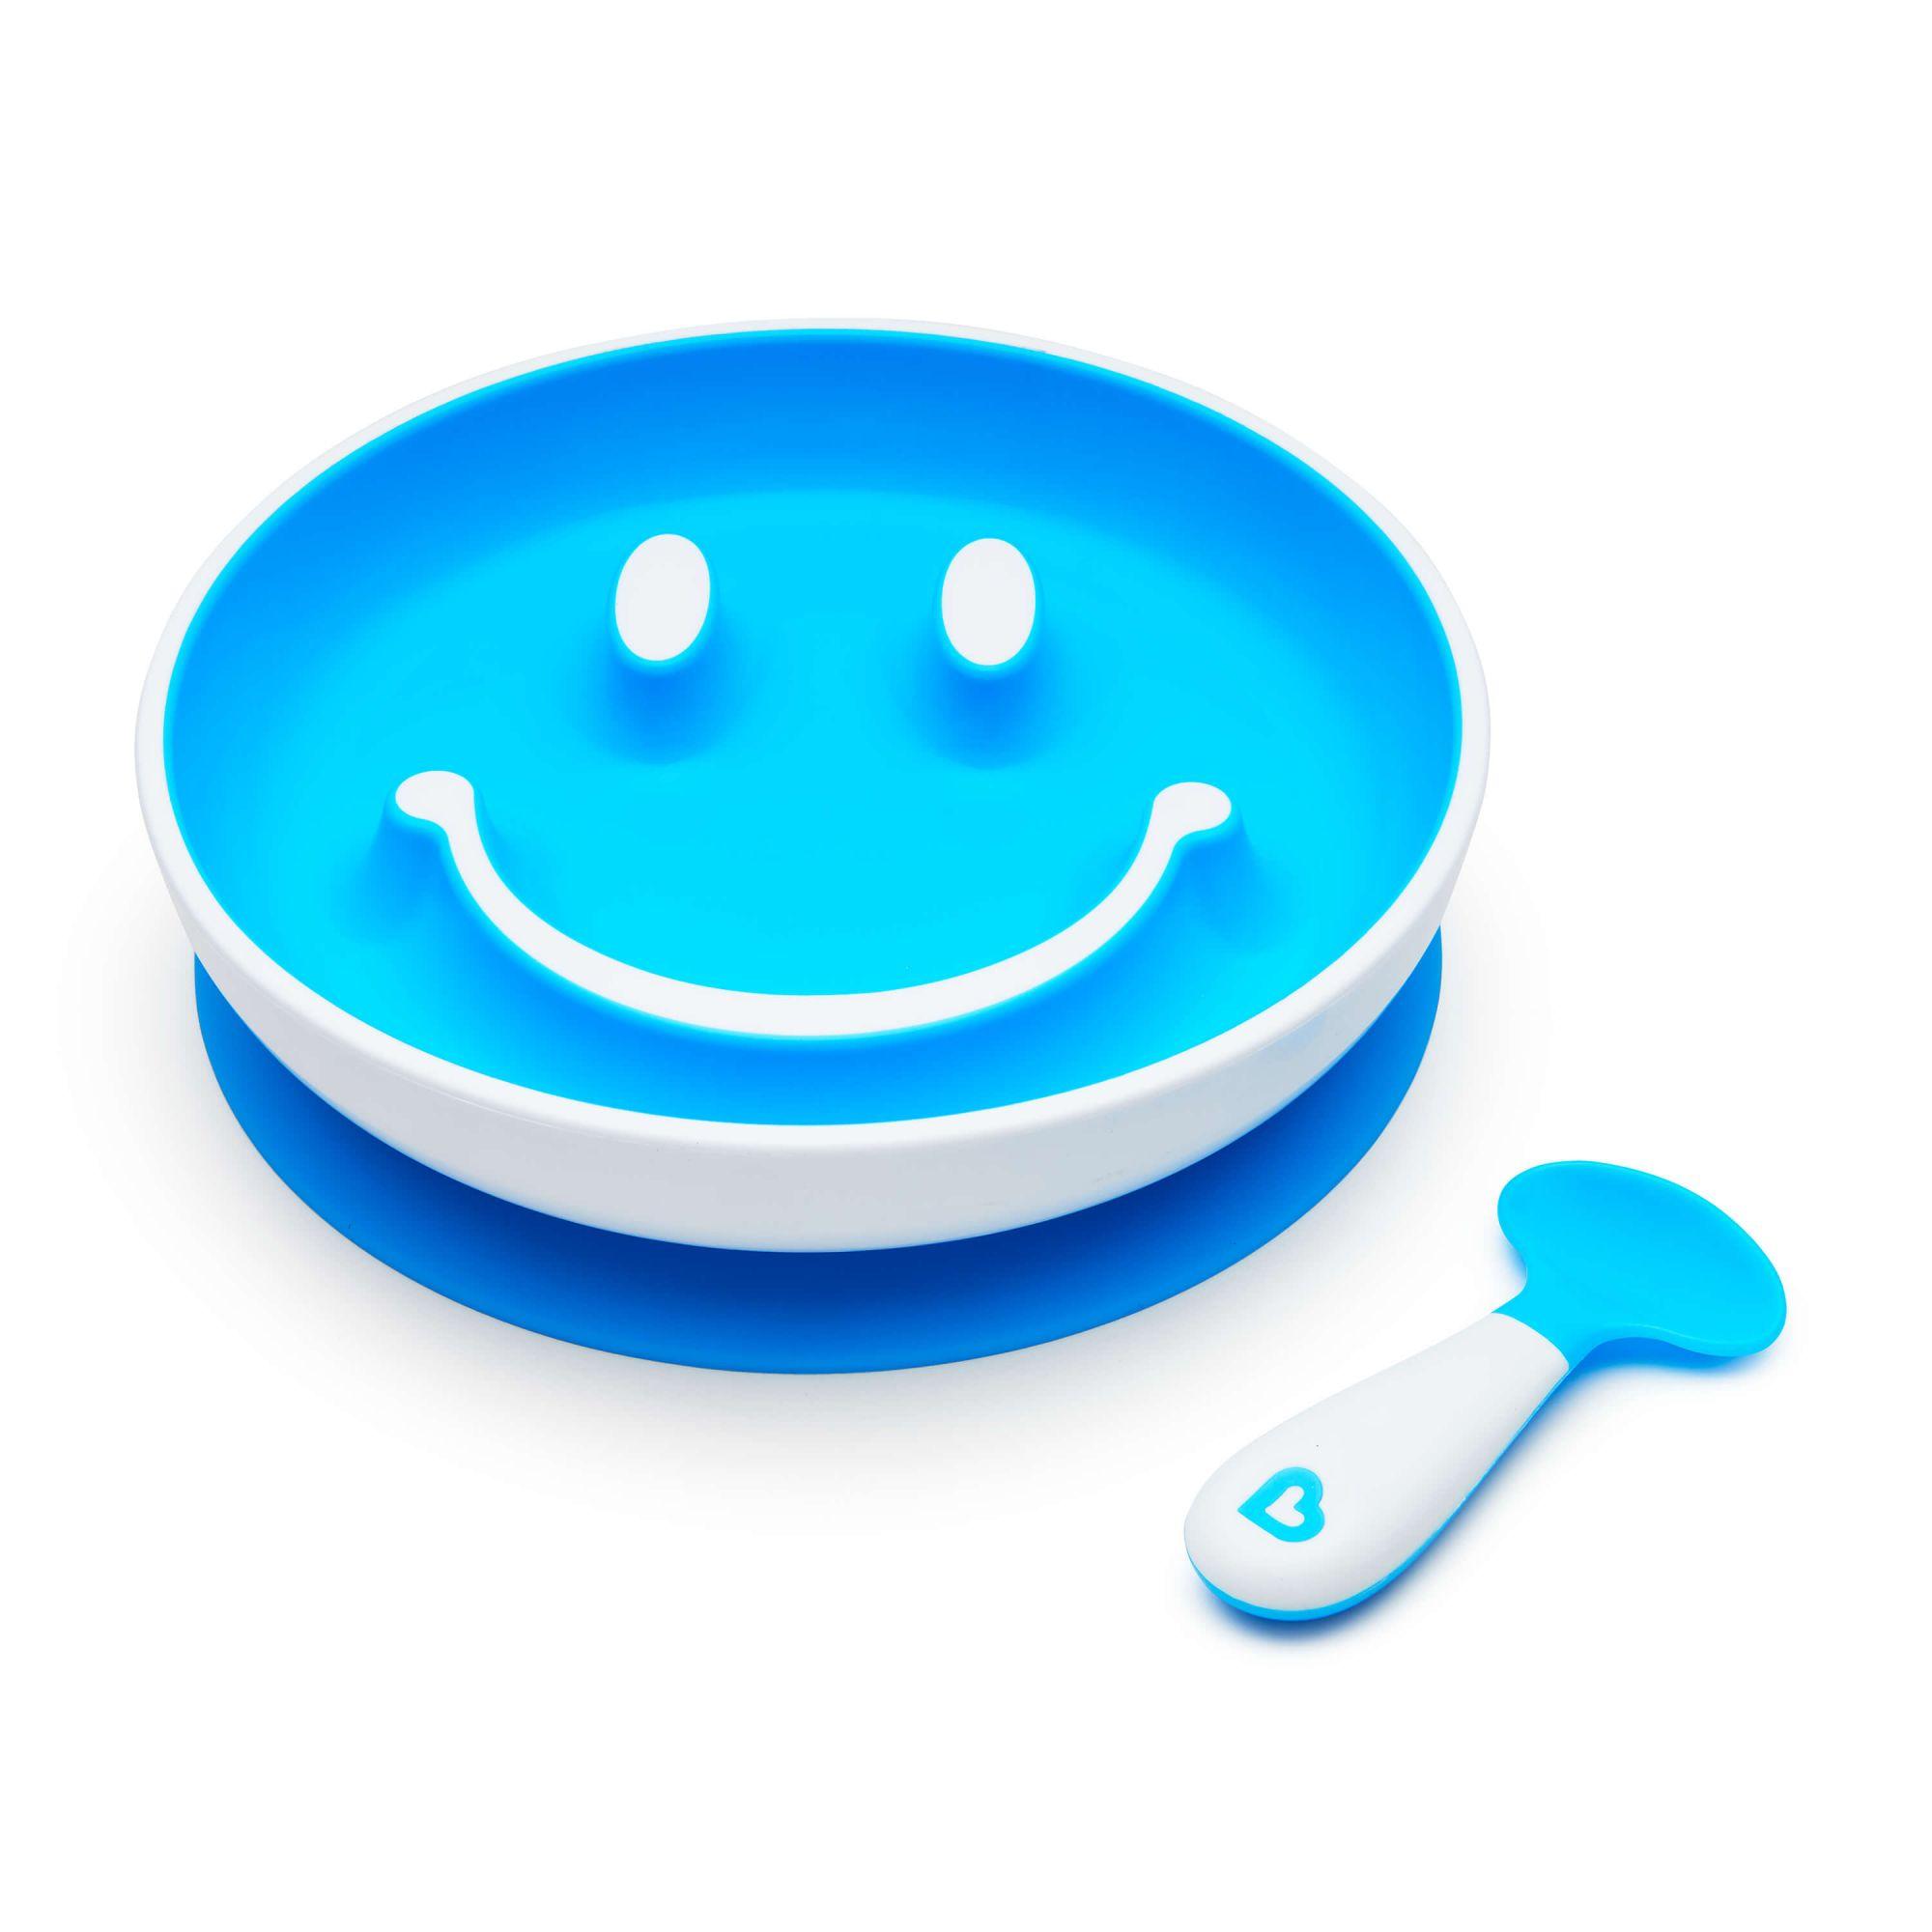 PRATO SMILE COM VENTOSA E COLHER - MUNCHKIN